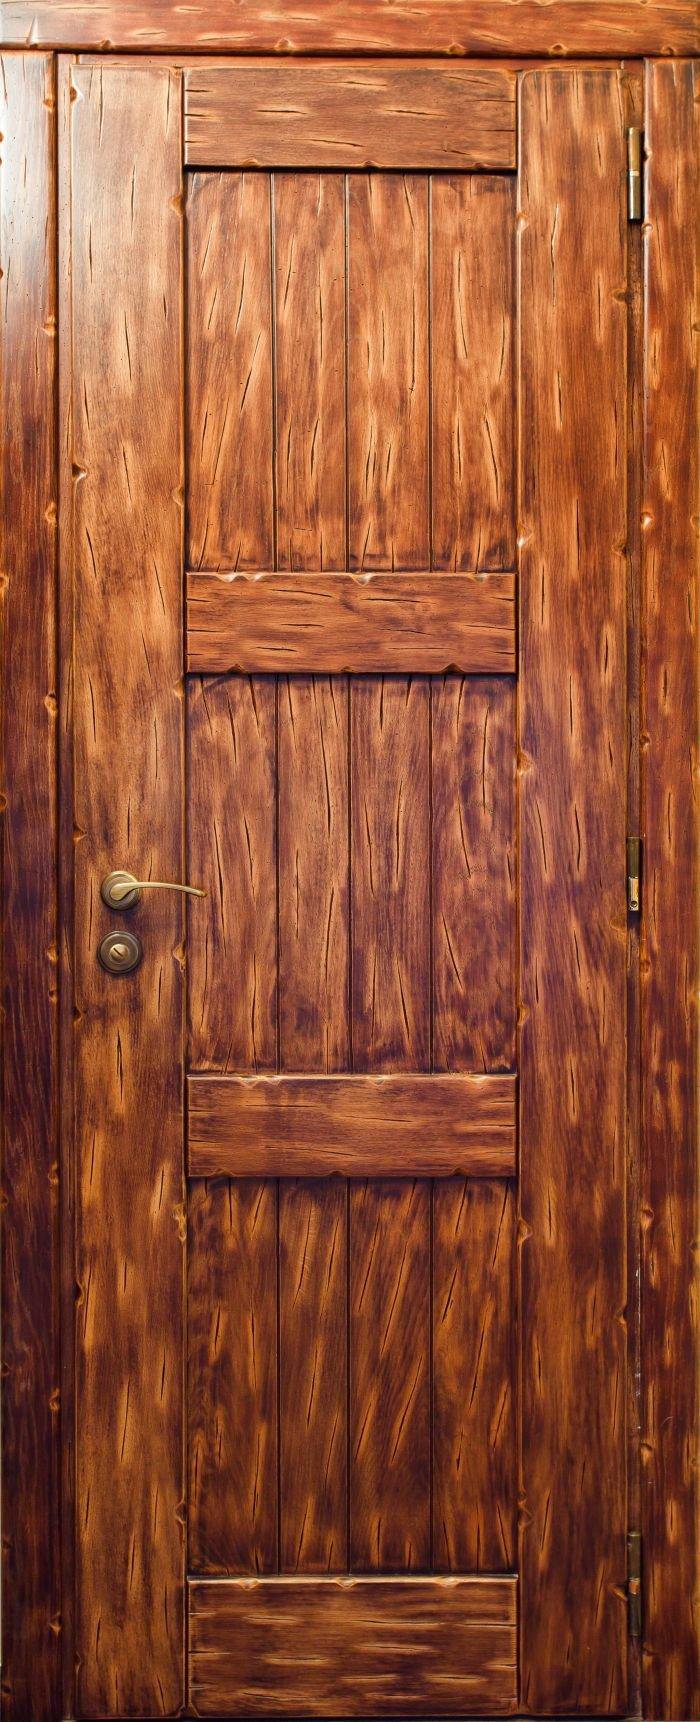 Міжкімнатні двері, фото-3